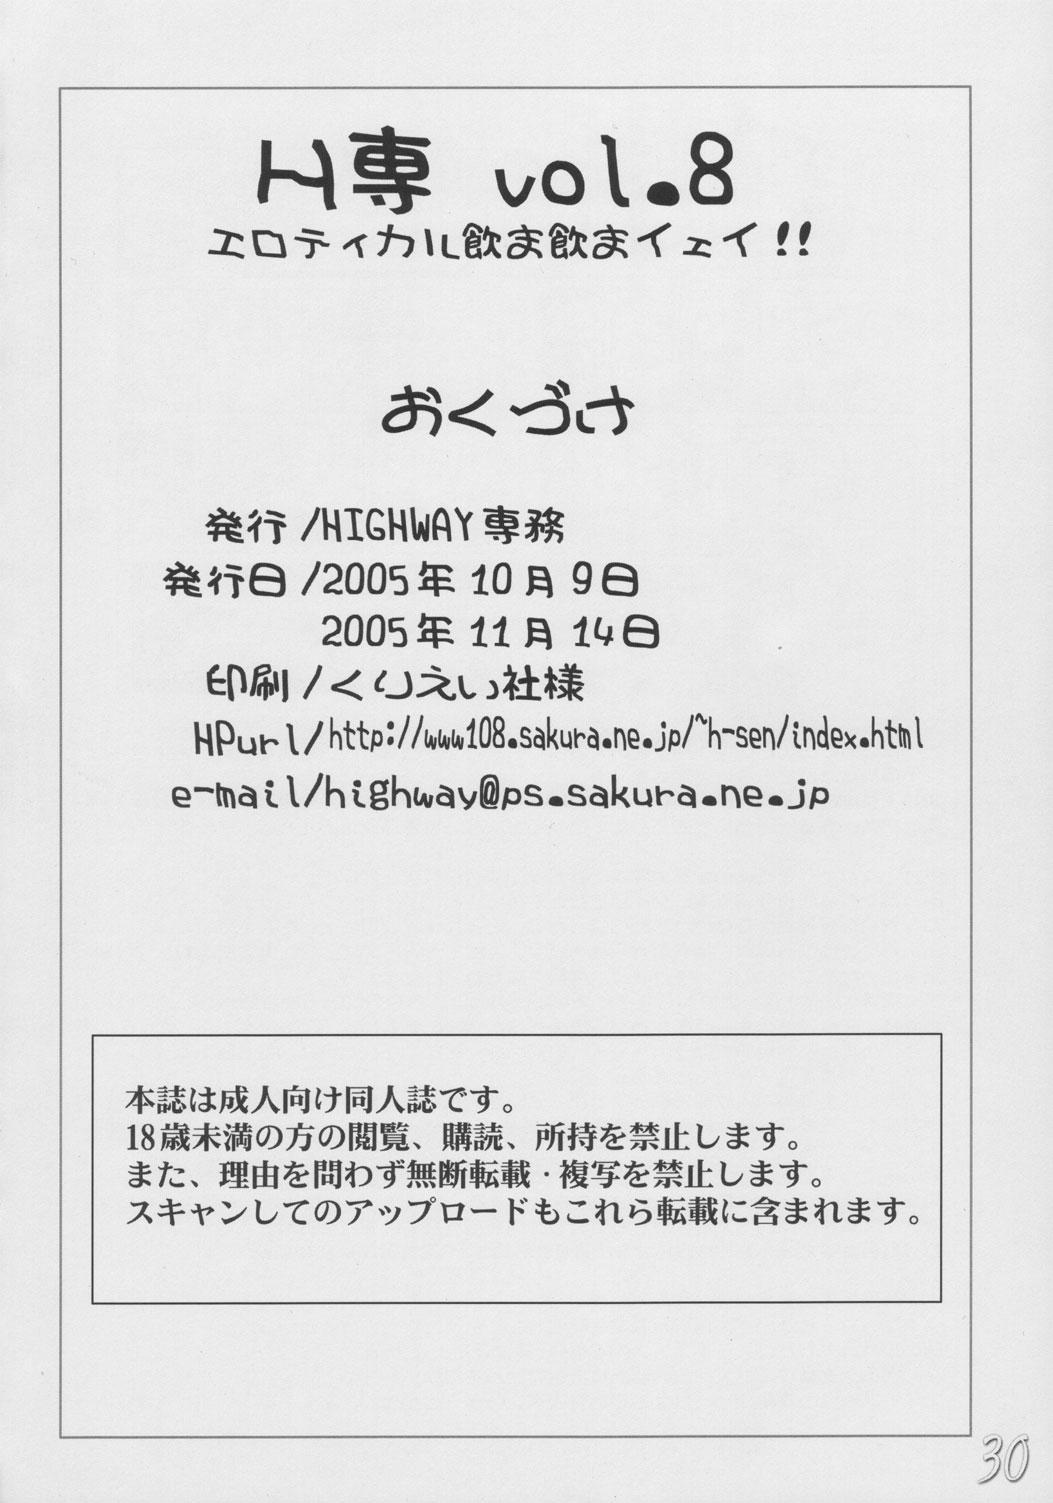 (ComiComi8) [HIGHWAY-SENMU (Maban, Saikoubi)] H-Sen vol. 8 -Erotical noma noma iei!!- (BLEACH) 28